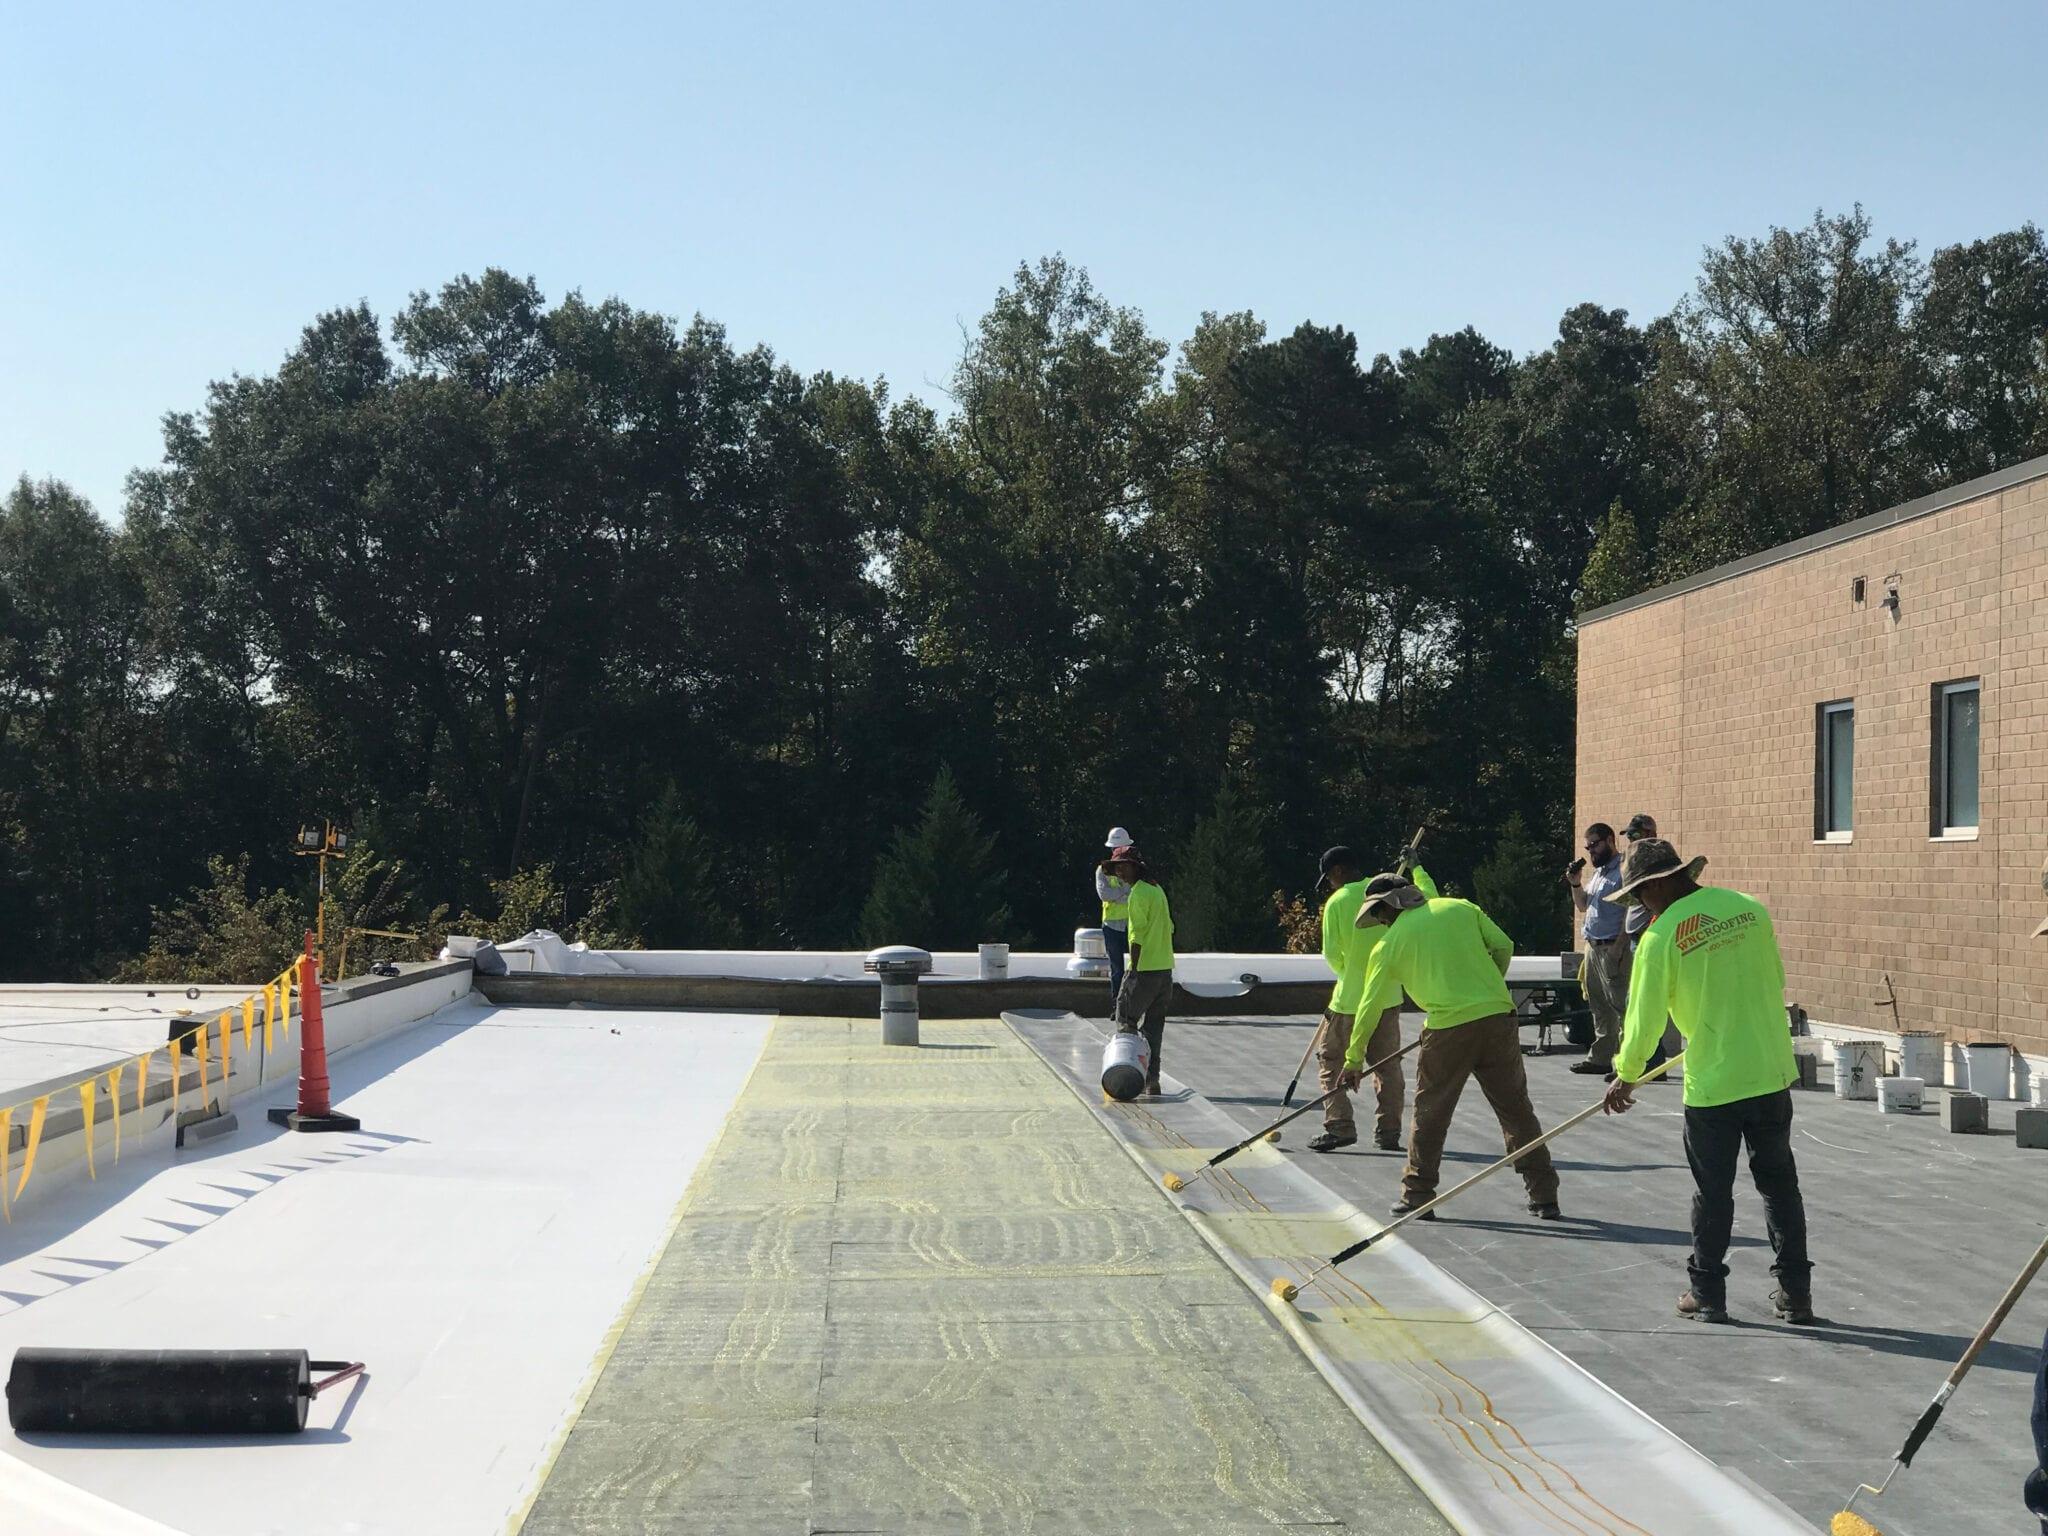 WNC Roofers on a school in greenville, SC